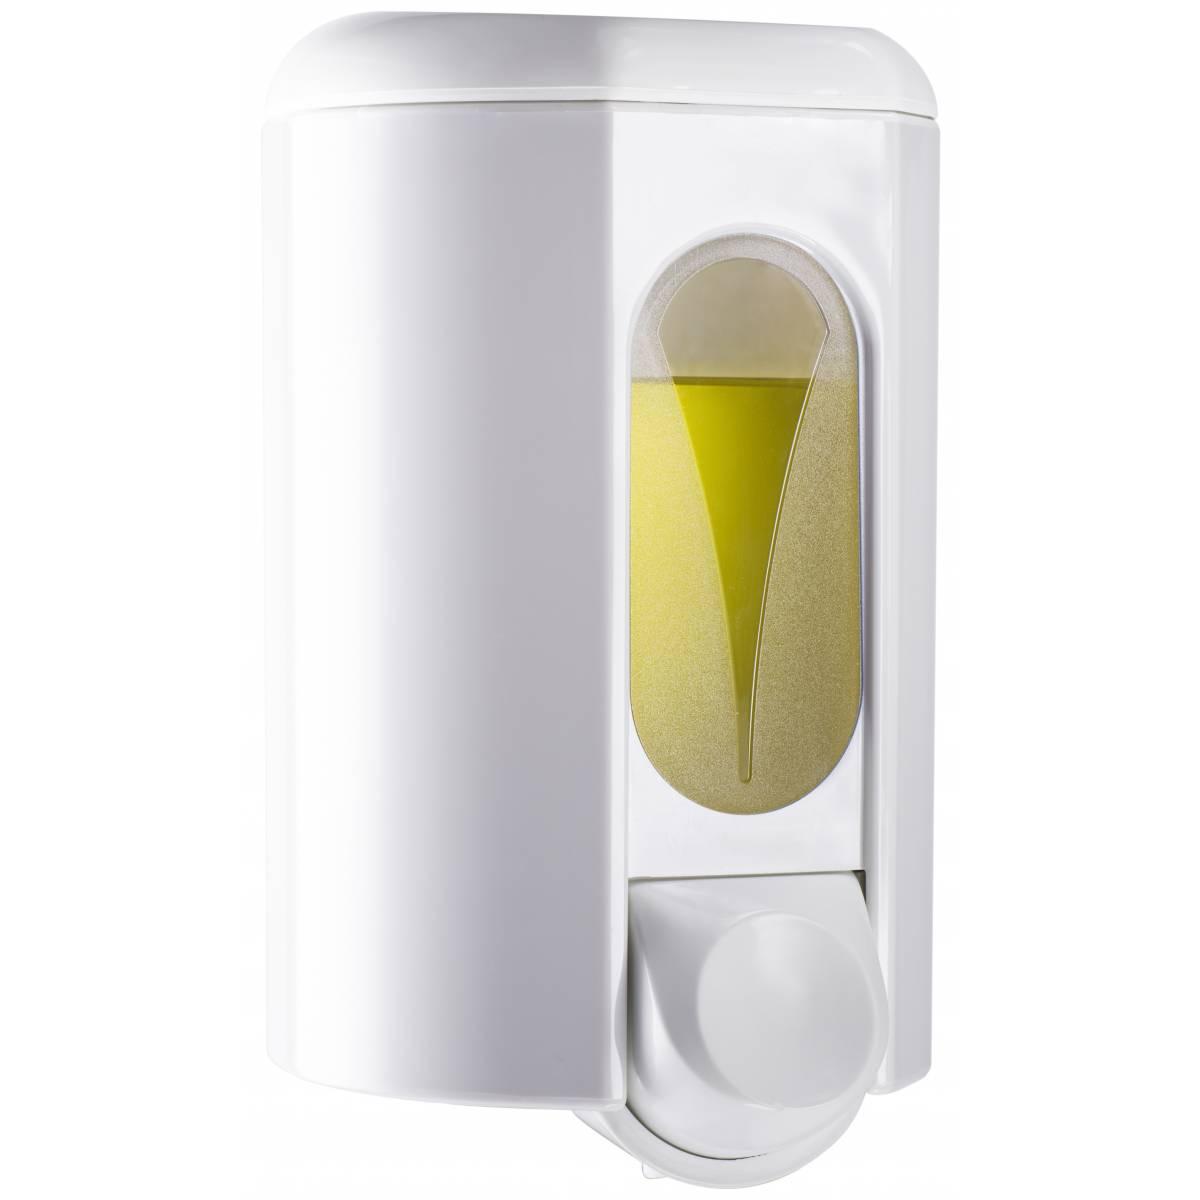 Дозатор жидкого мыла Mar Plast ACQUALBA (563WIN2) A56311W2 Mar Plast